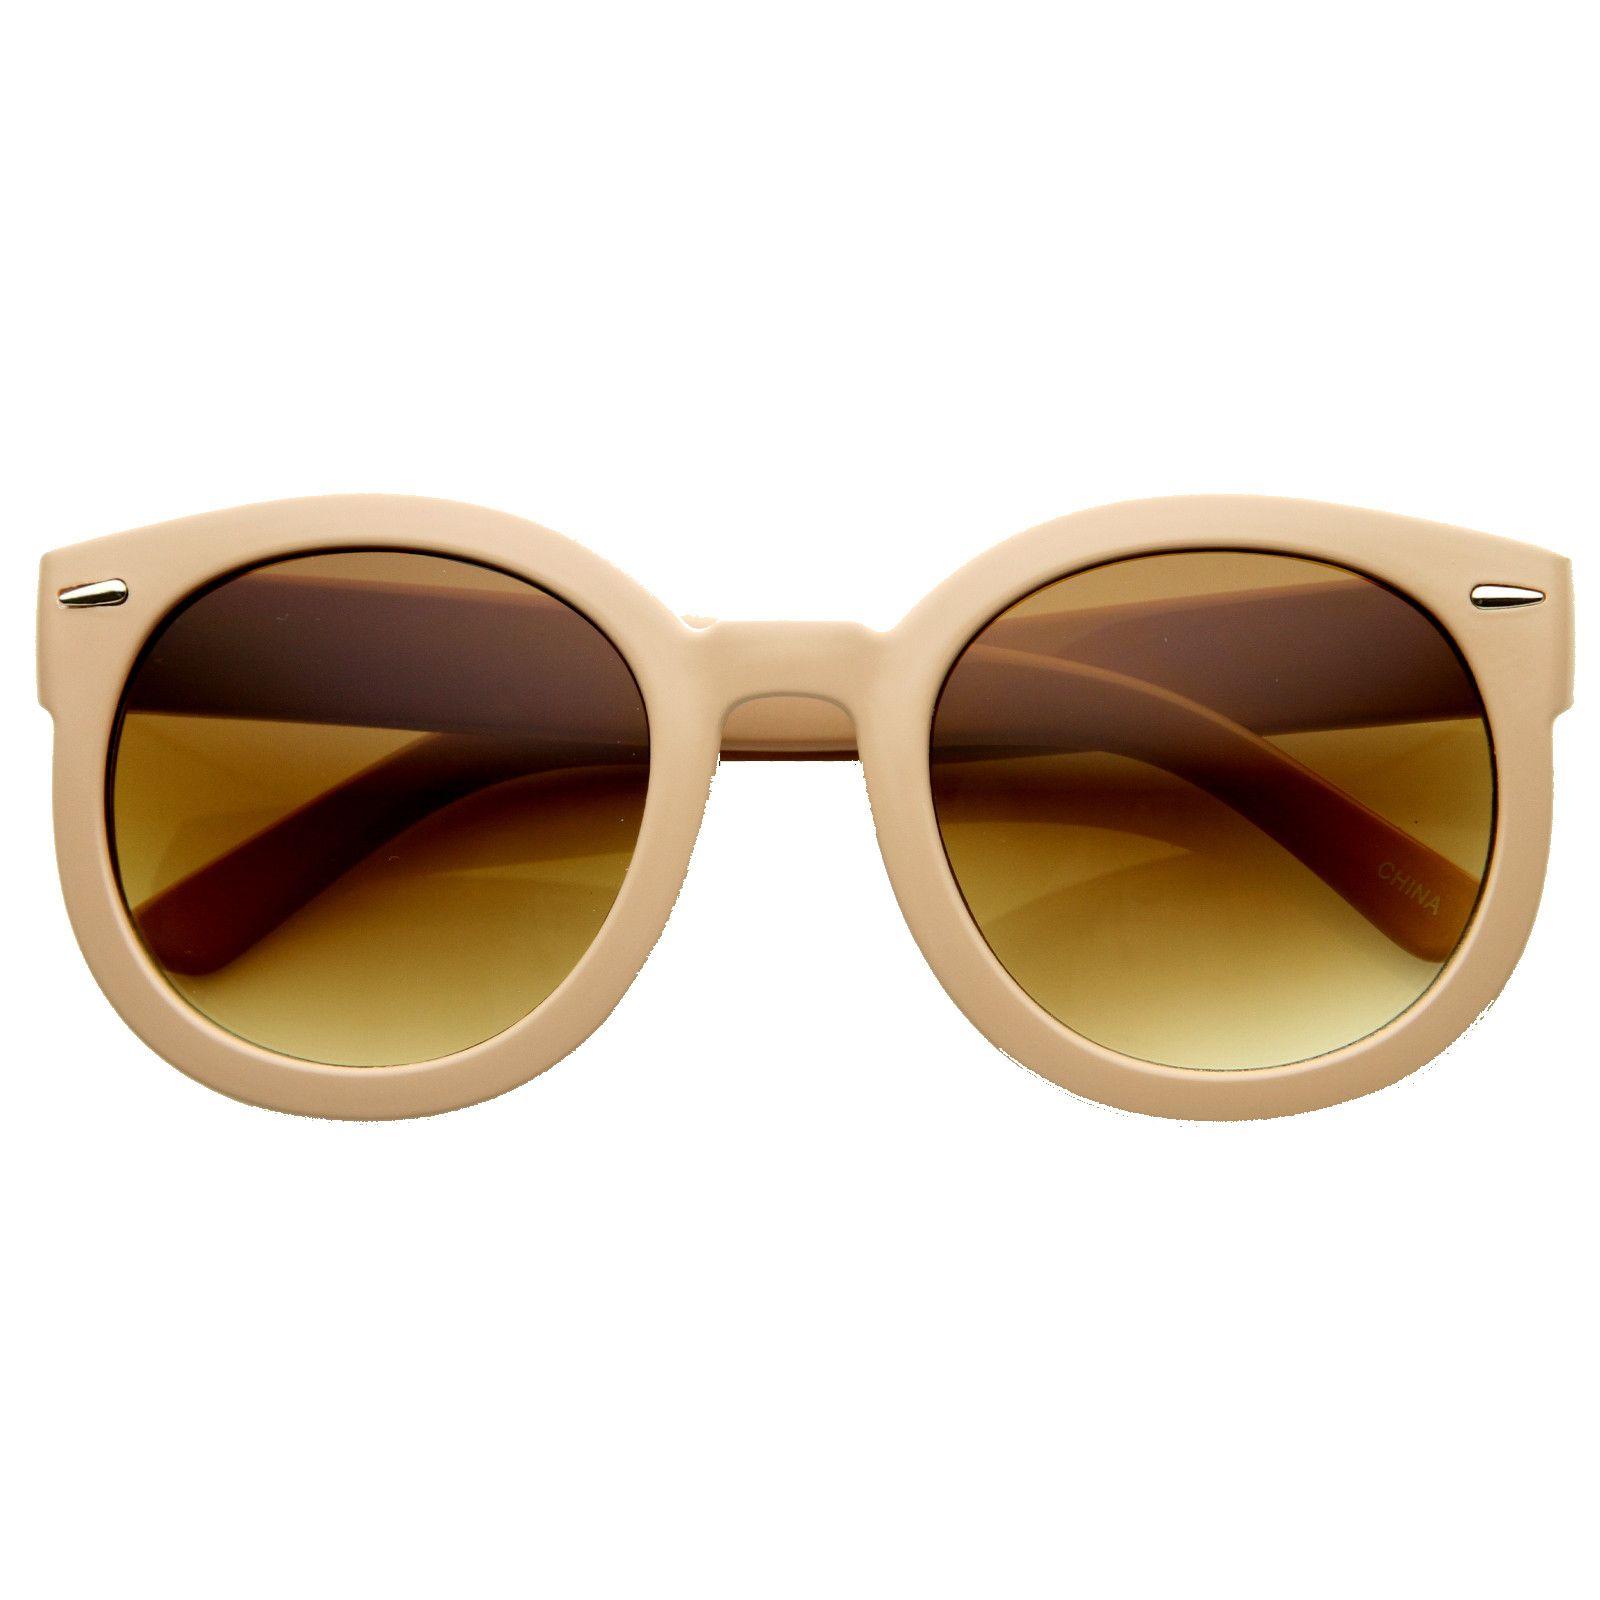 7f3b00808f4 Womens Designer Round Oversize Retro Fashion Sunglasses 8623